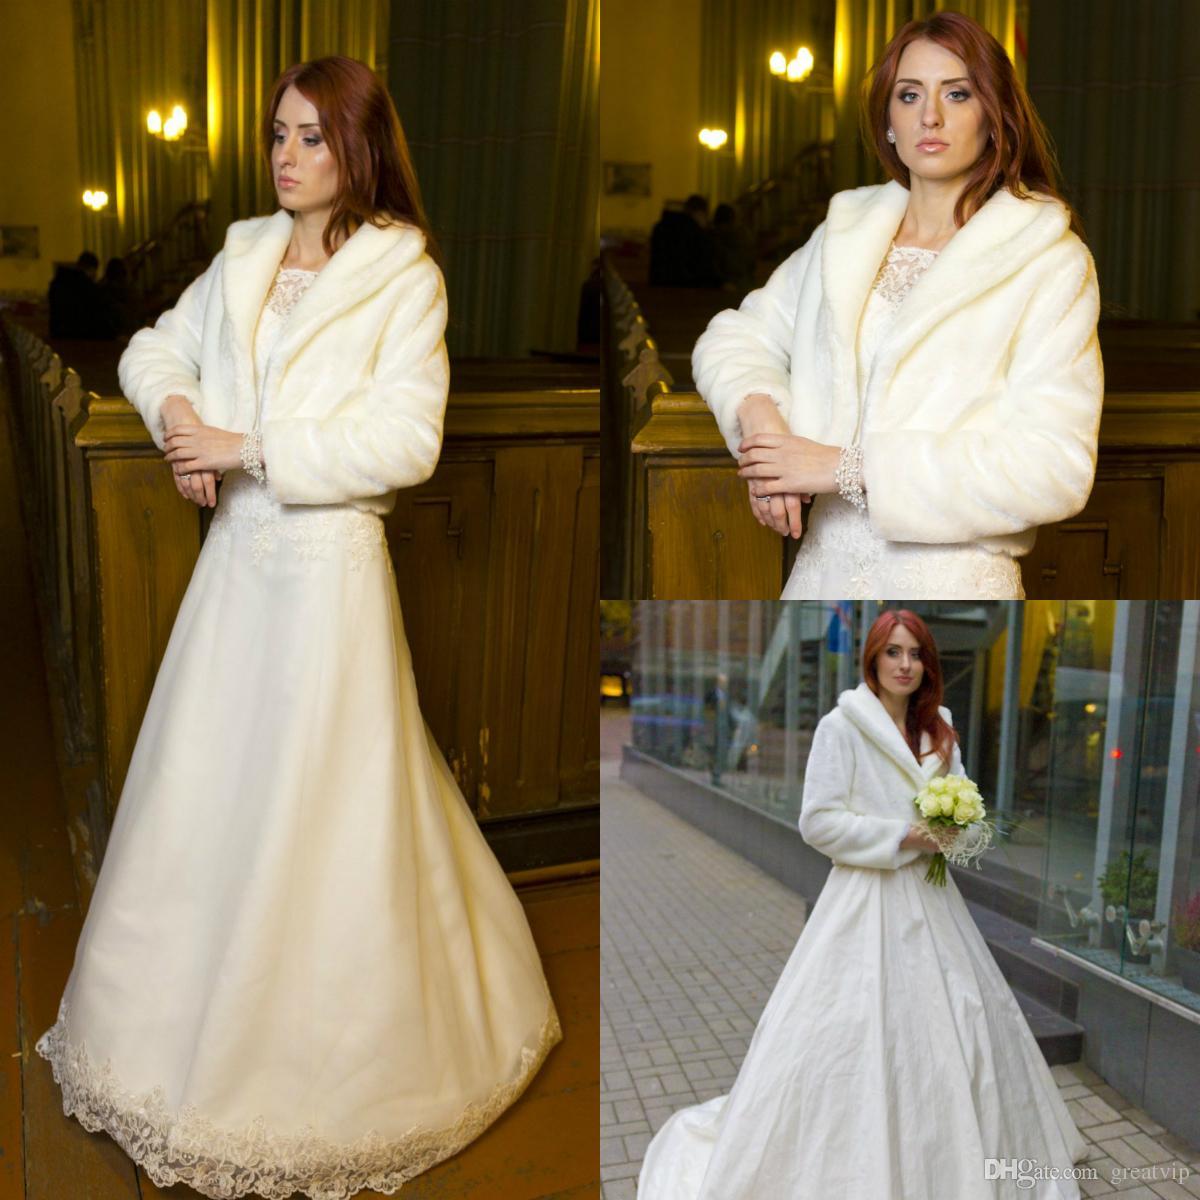 White Winter Warm Knitting Lapel Cloak Faux Fur Cashmere Shawl Pashmina Bridal Wraps Poncho Capes Jackets For Weddings Bolero Shrugs